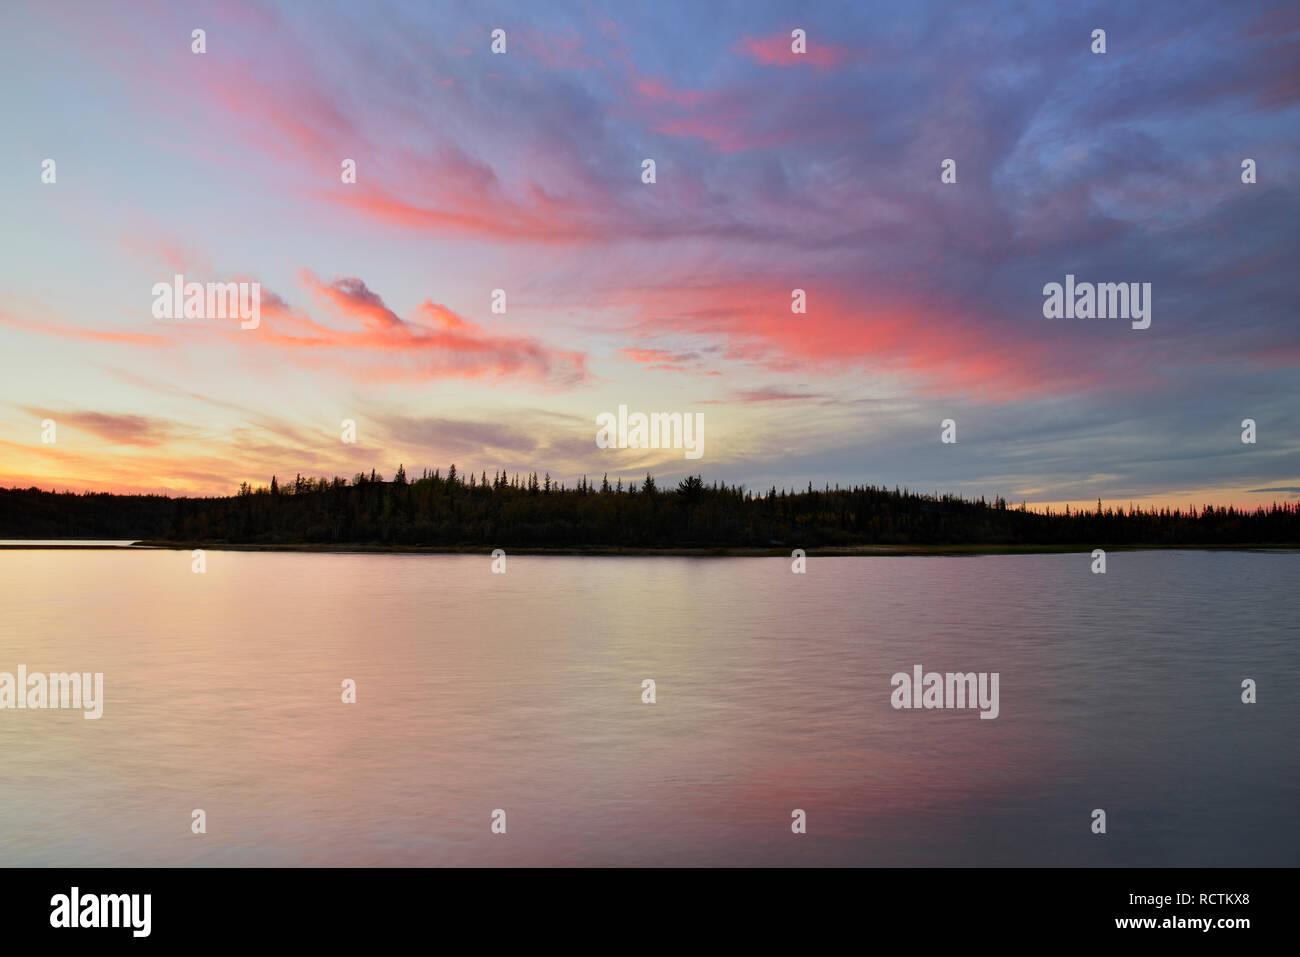 Prosperous Lake at sunset, Yellowknife, Northwest Territories, Canada - Stock Image